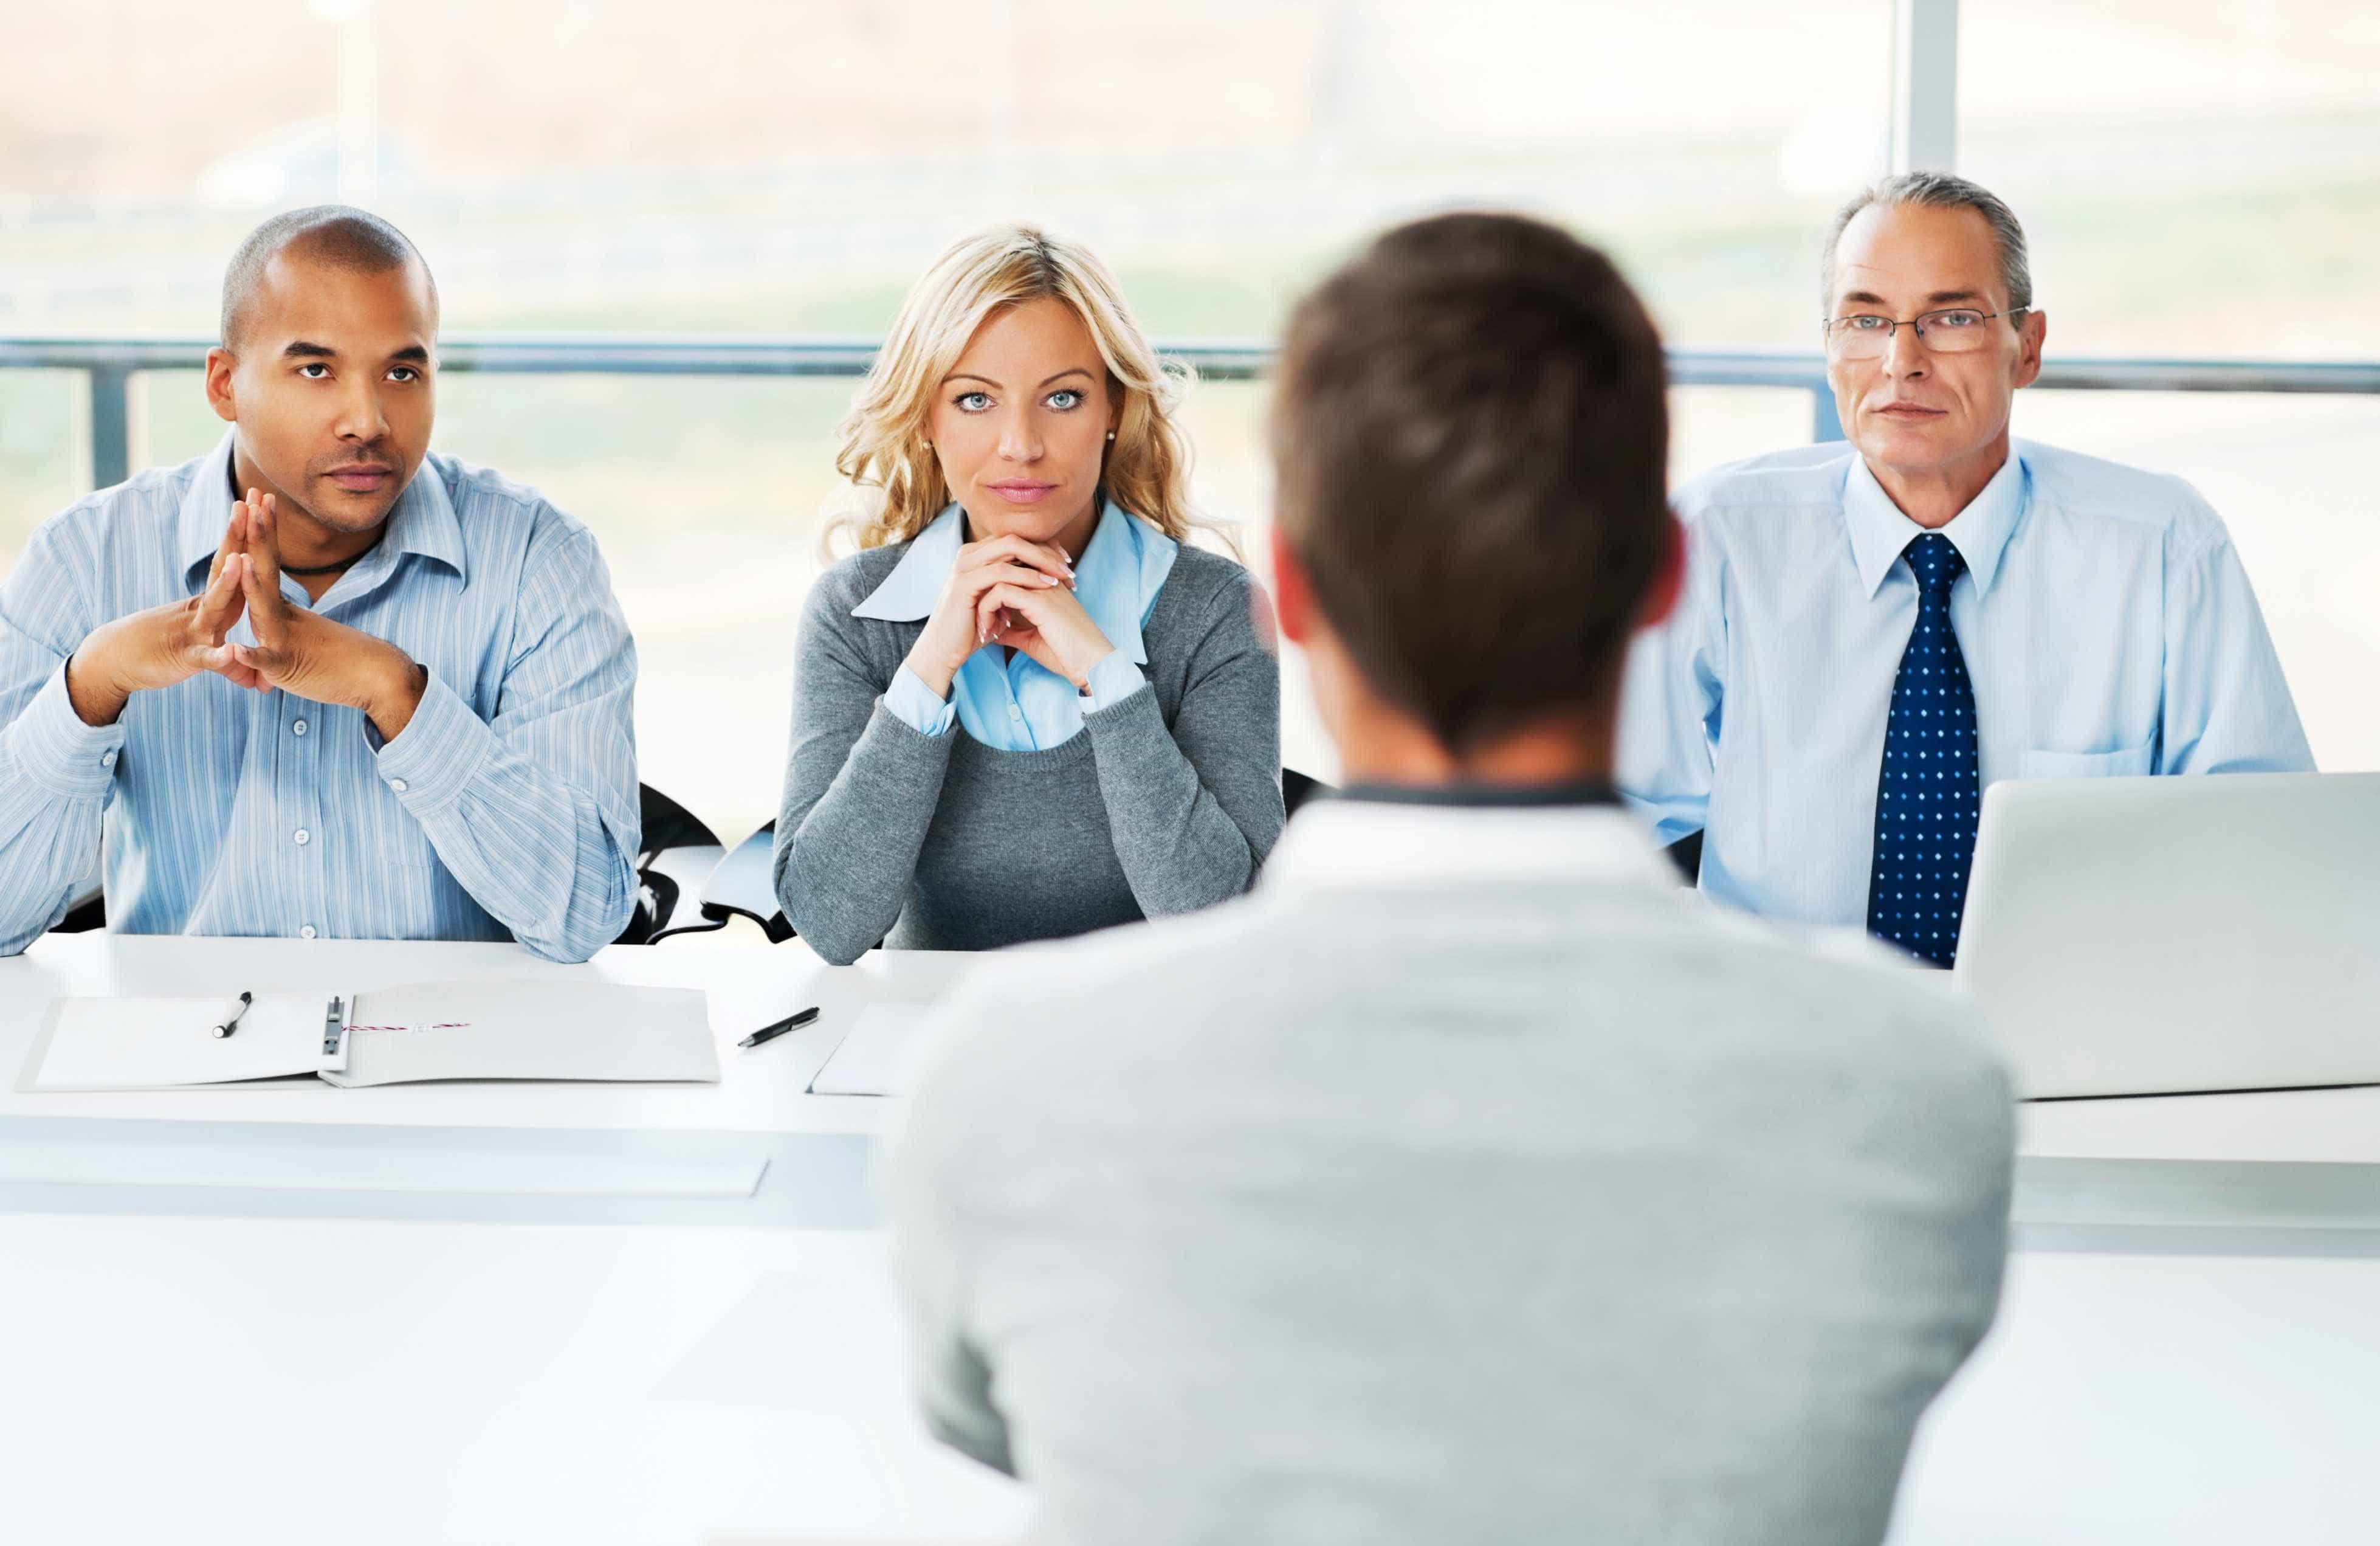 ROFFquer contratar 230 consultores no próximo ano